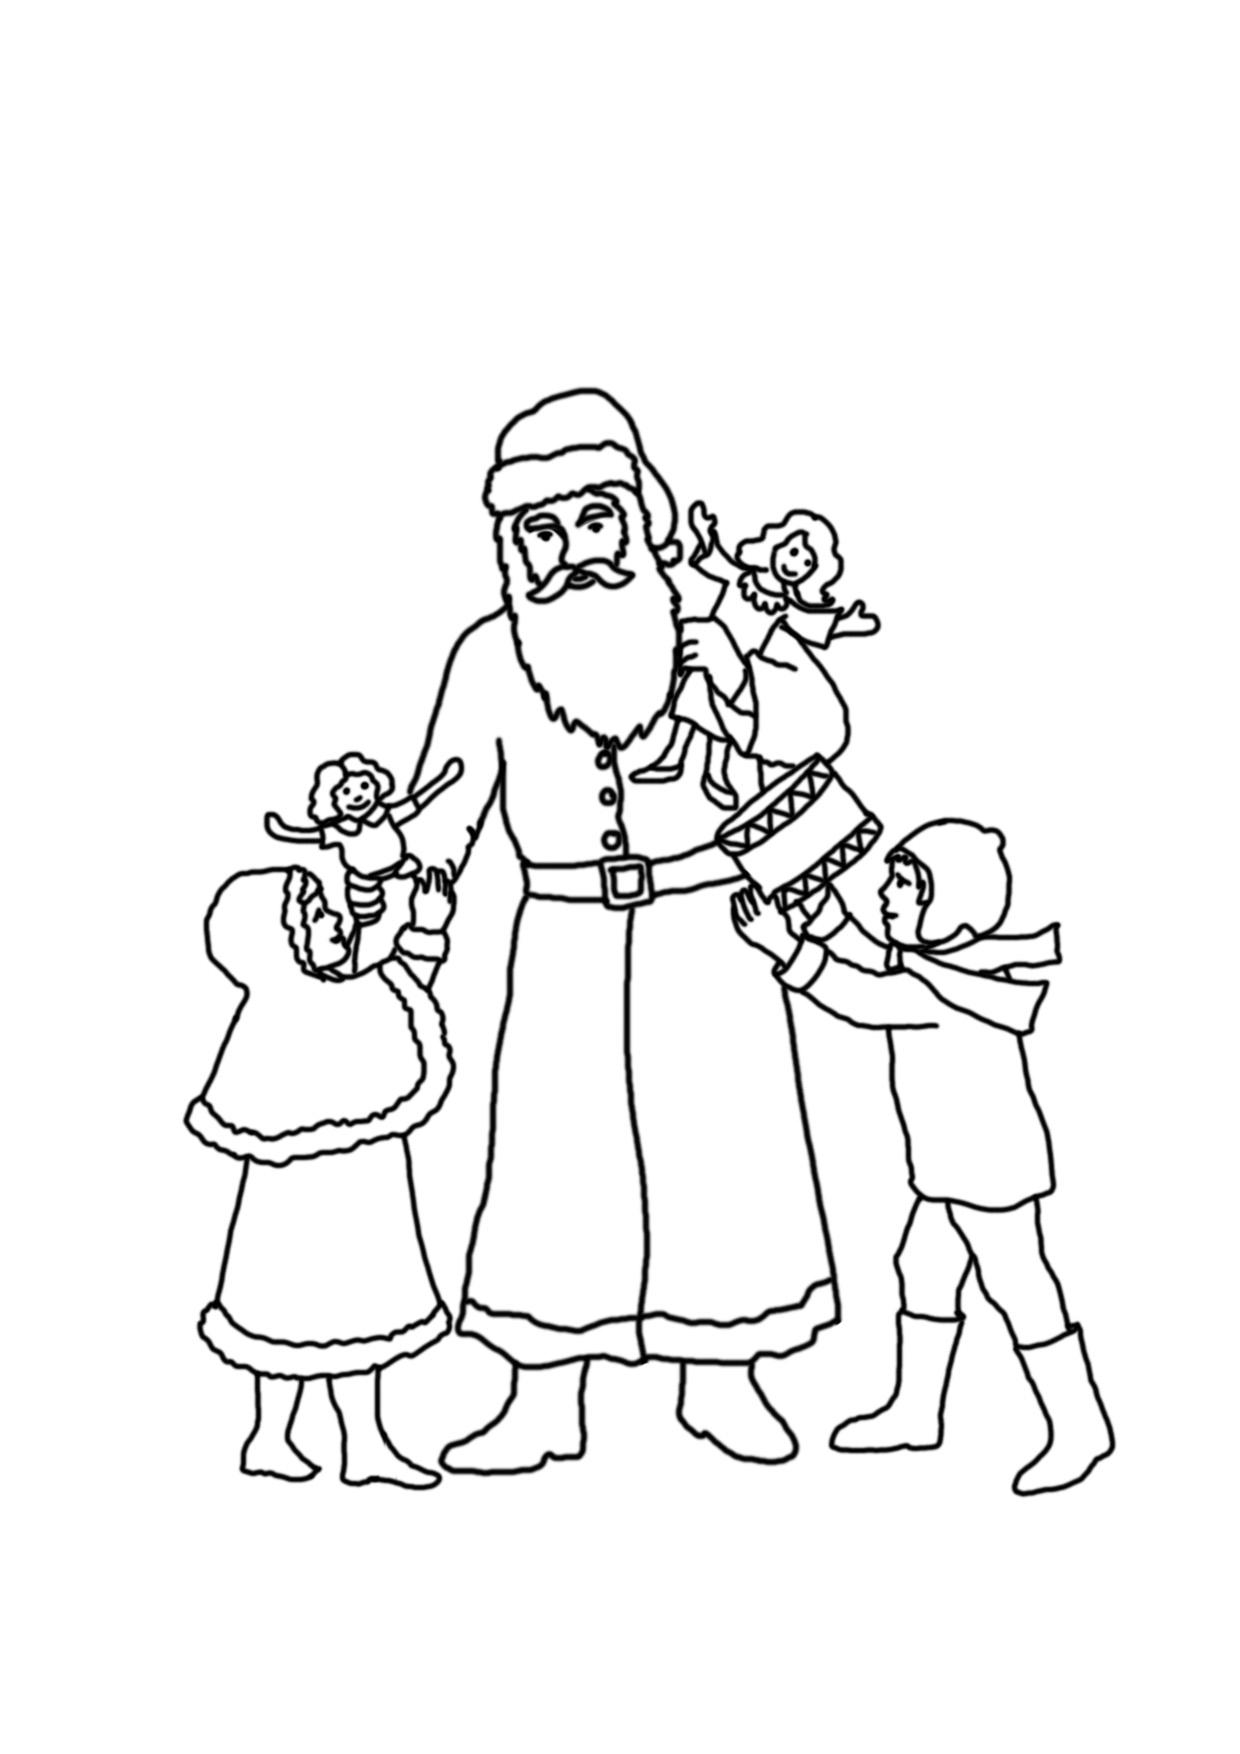 Santa Claus Coat Coloring Pages Sketch Coloring Page